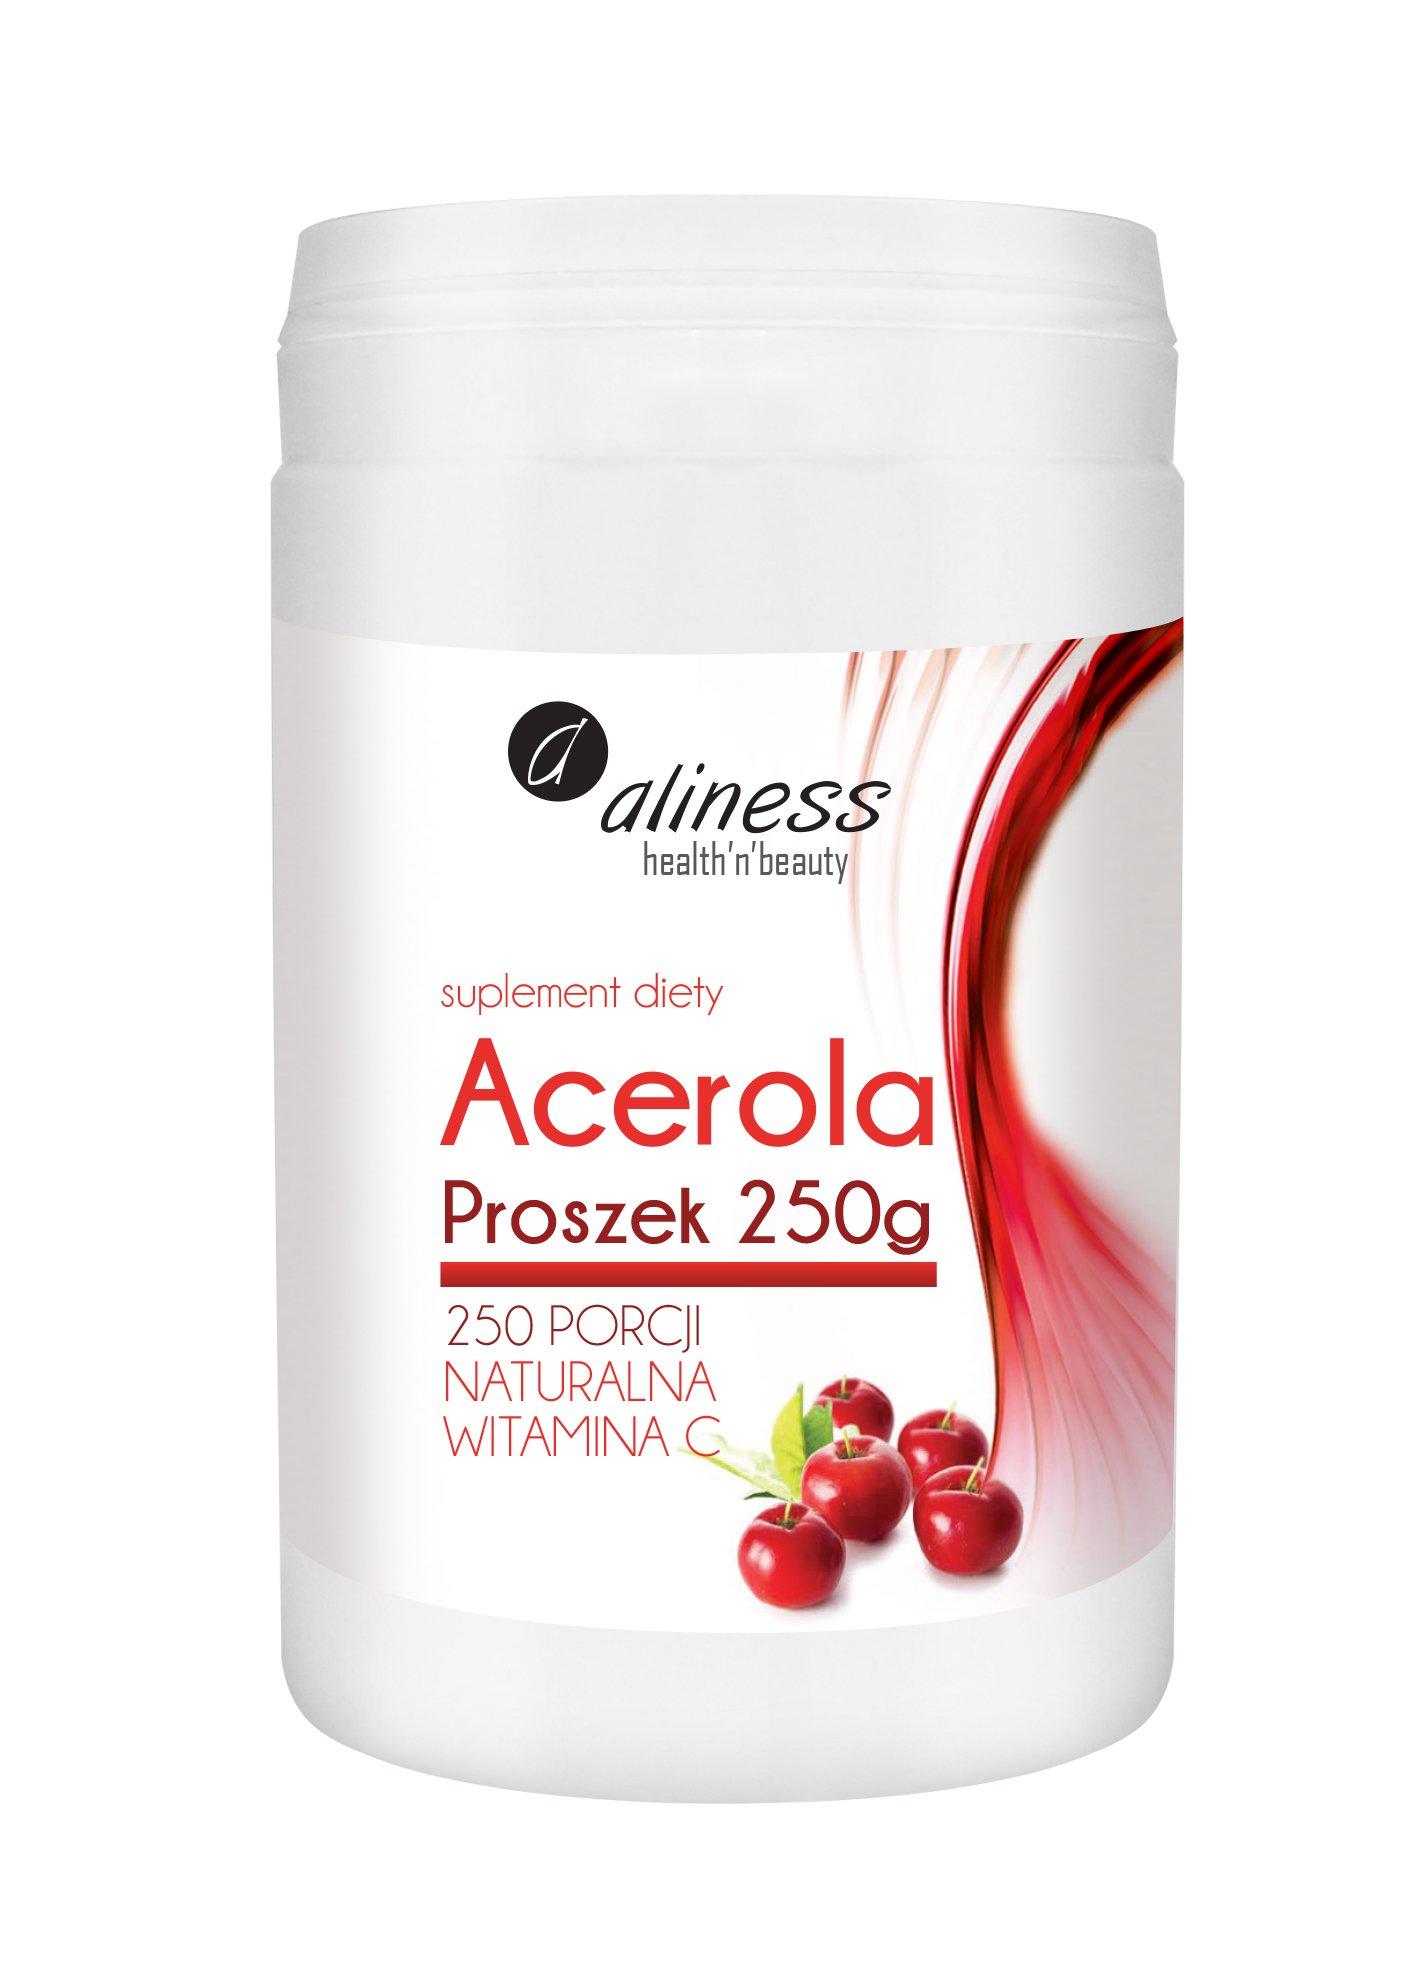 Aliness Acerola Proszek 250 g- naturalna witamina C